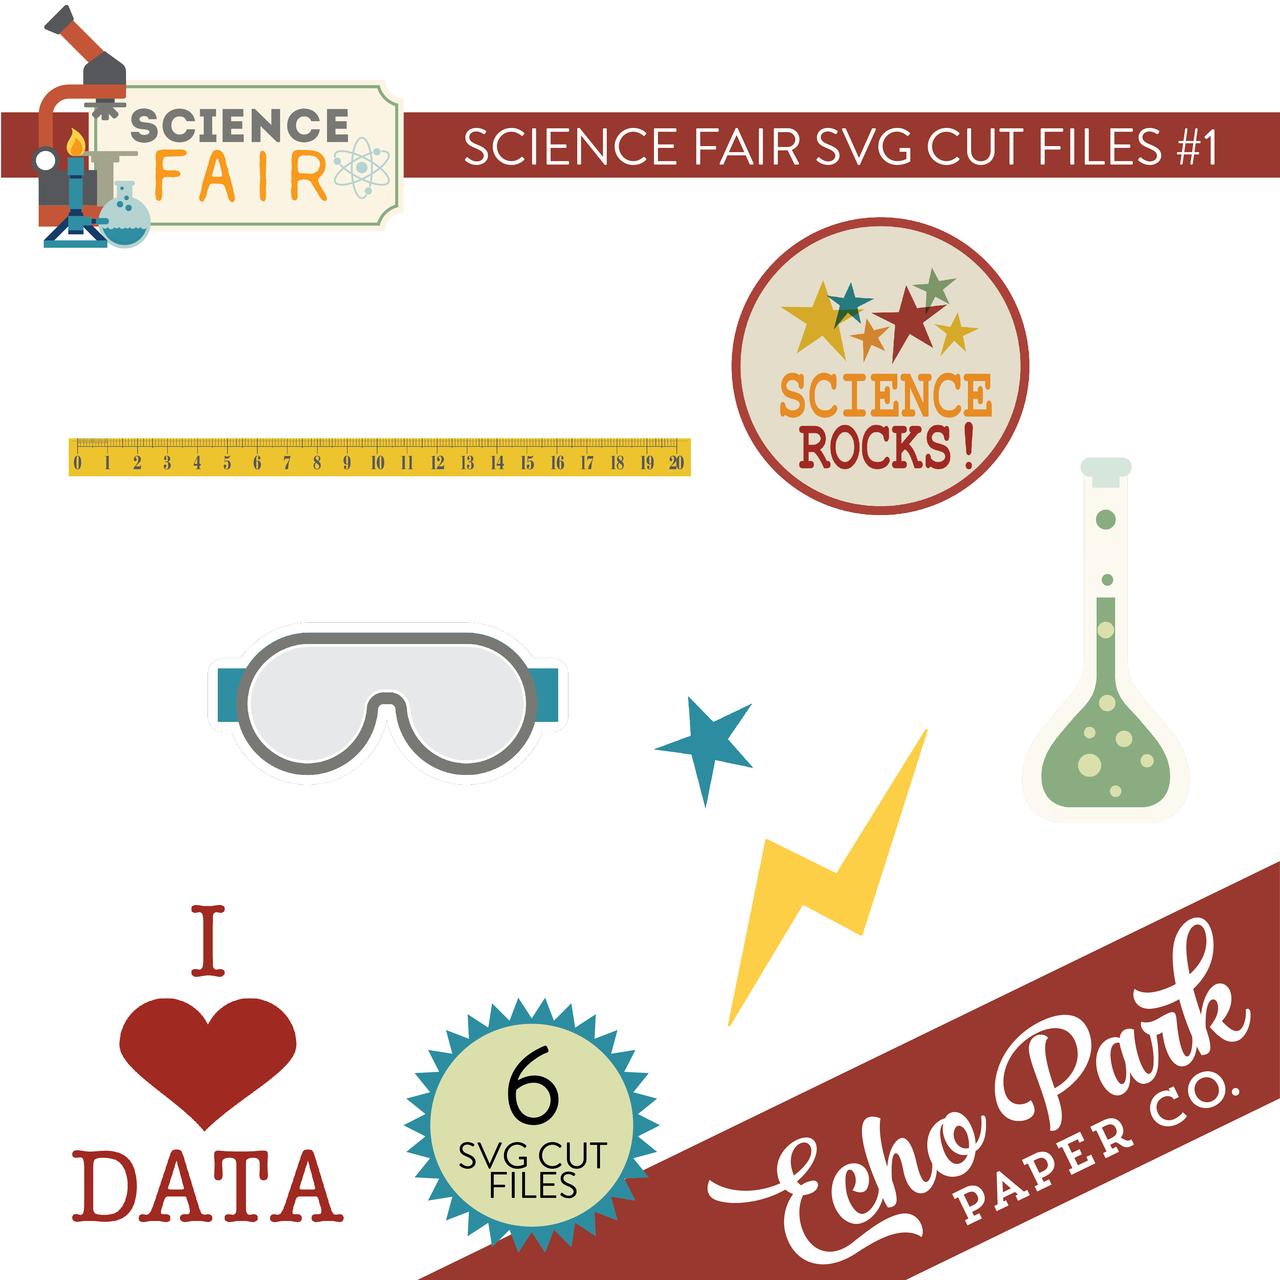 Science Fair SVG Cut Files #1